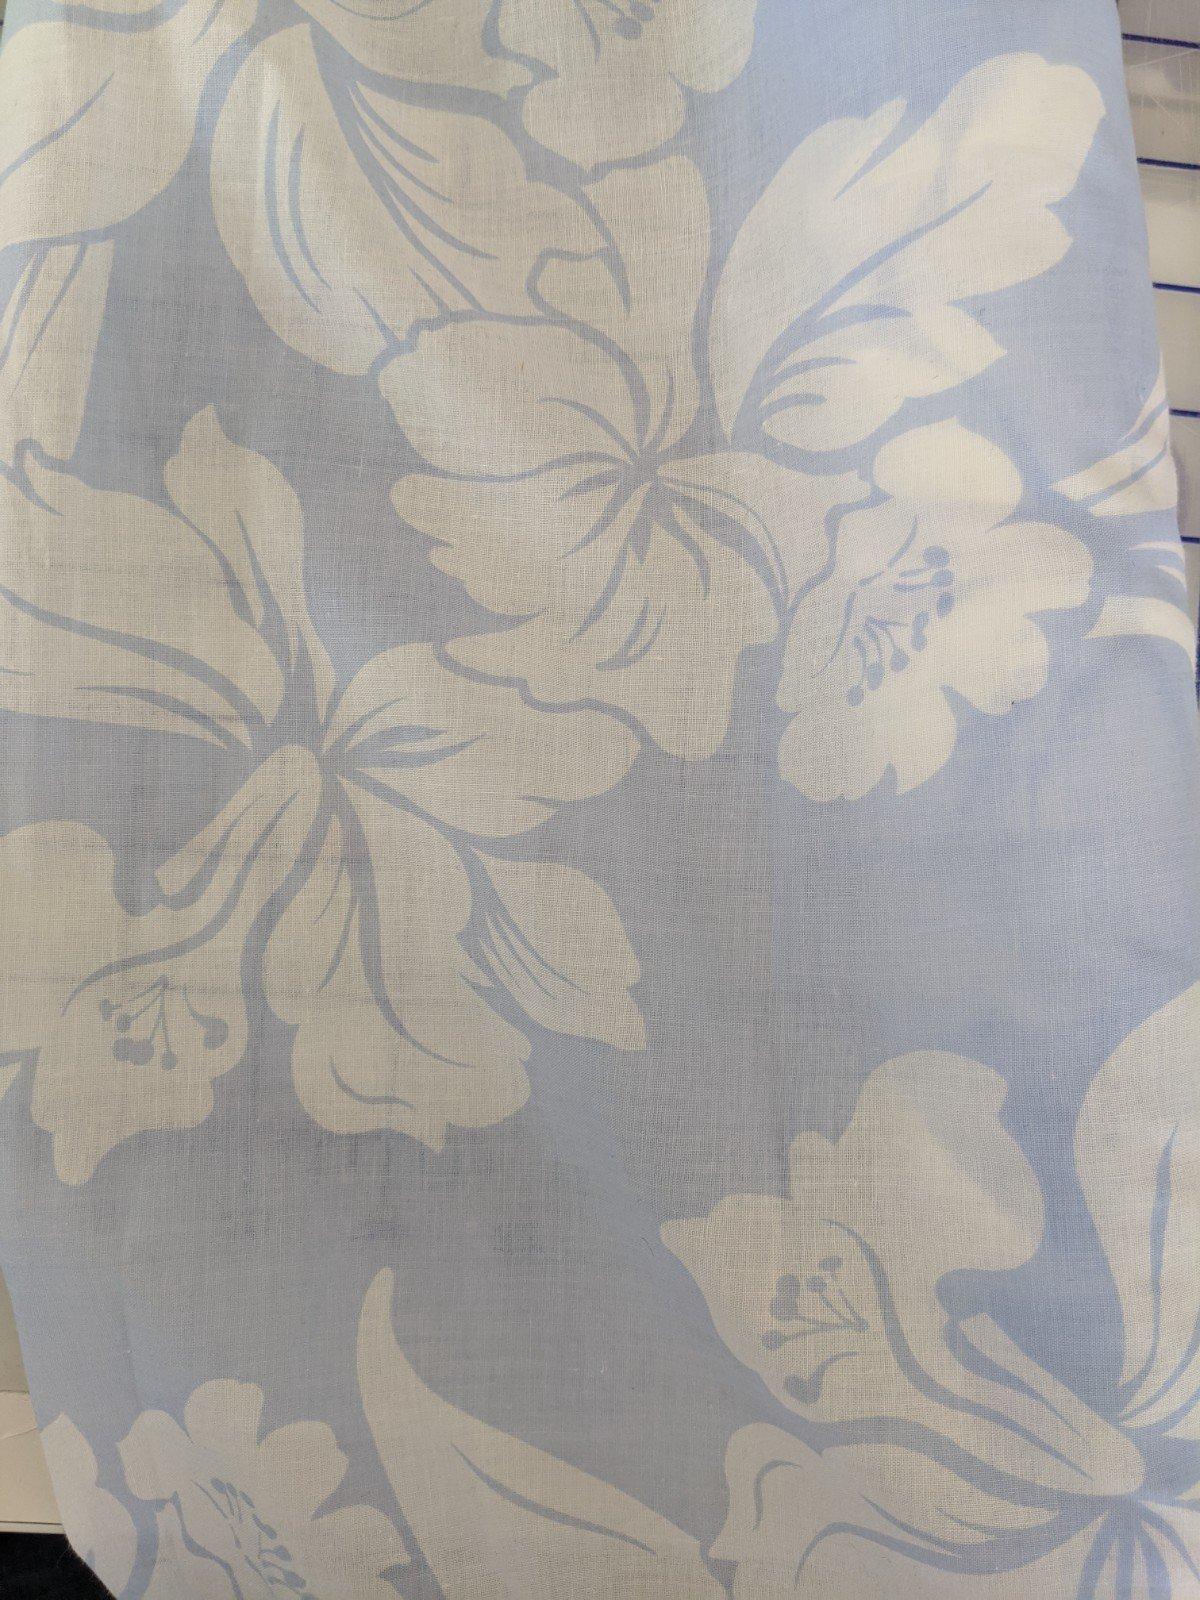 Cotton Voile - Hibiscus Print (Multiple Colors)